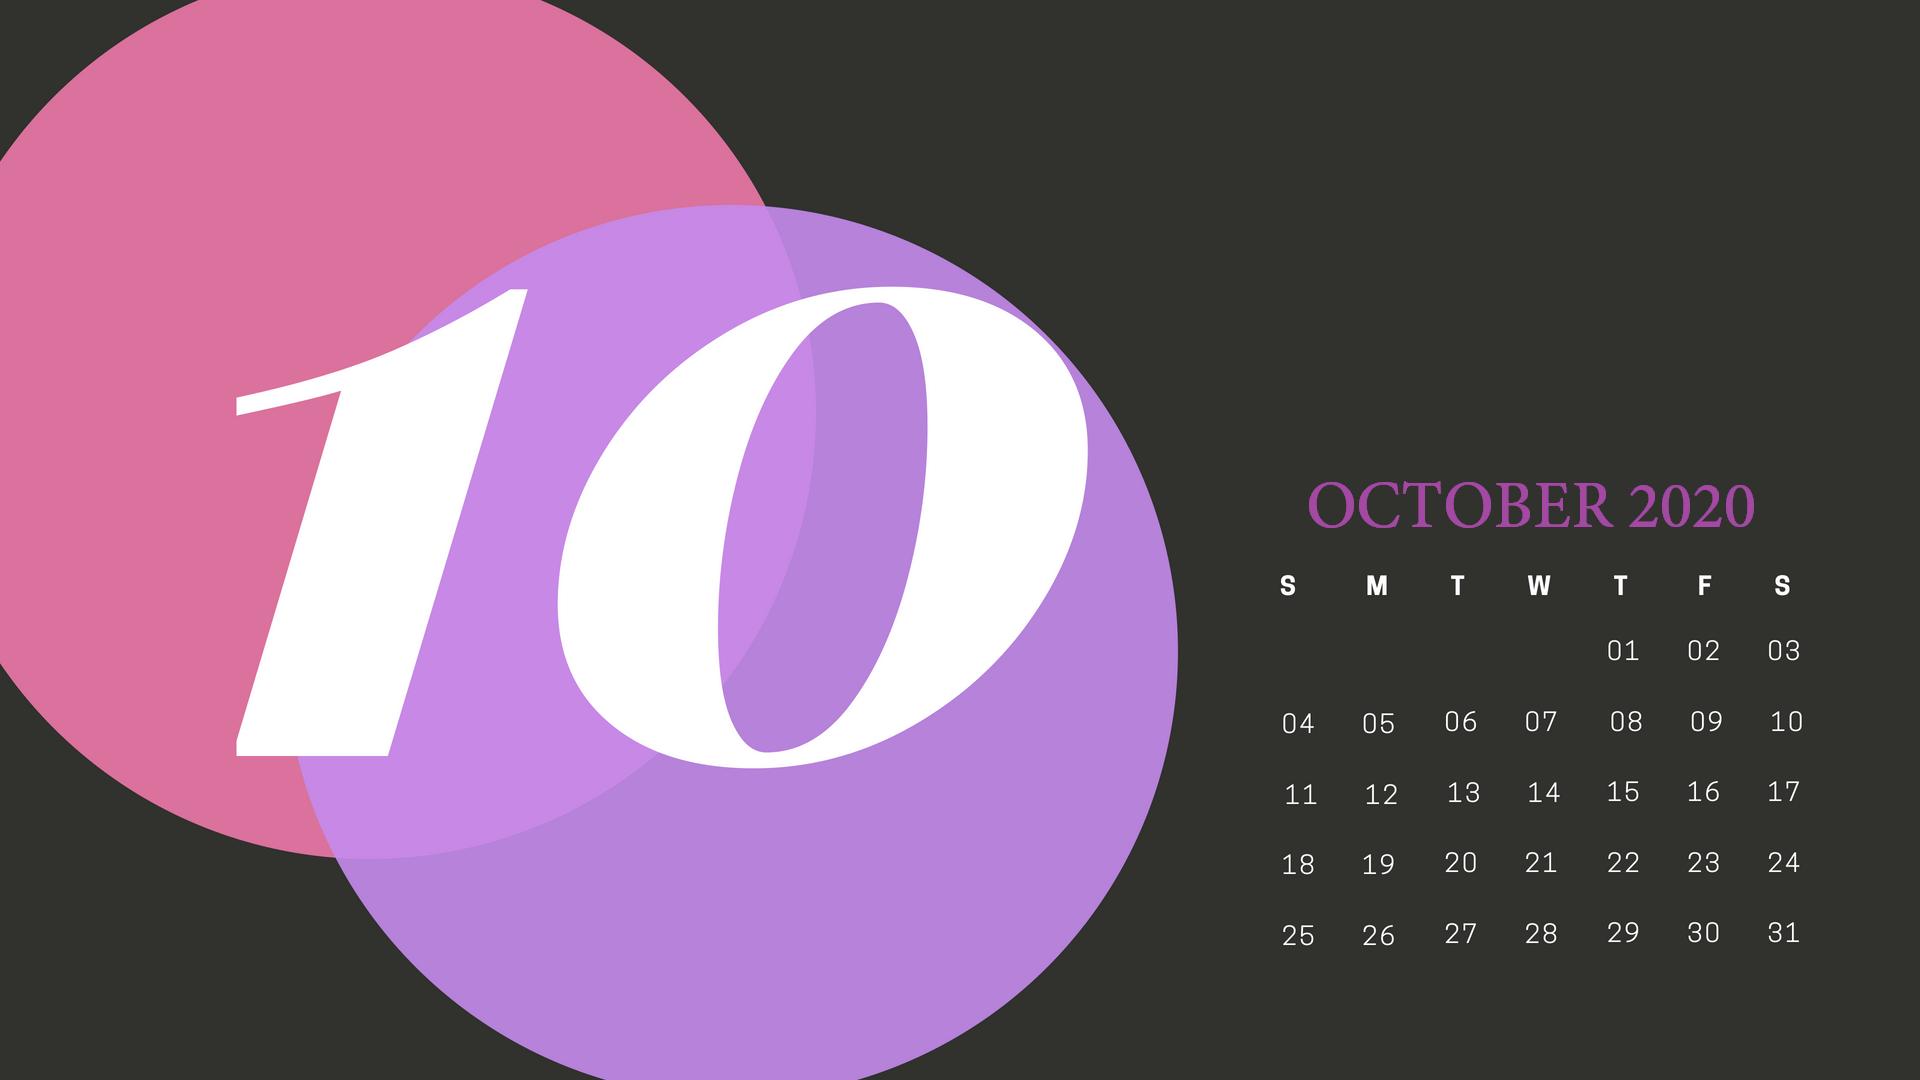 Cute October 2020 Calendar Wallpaper